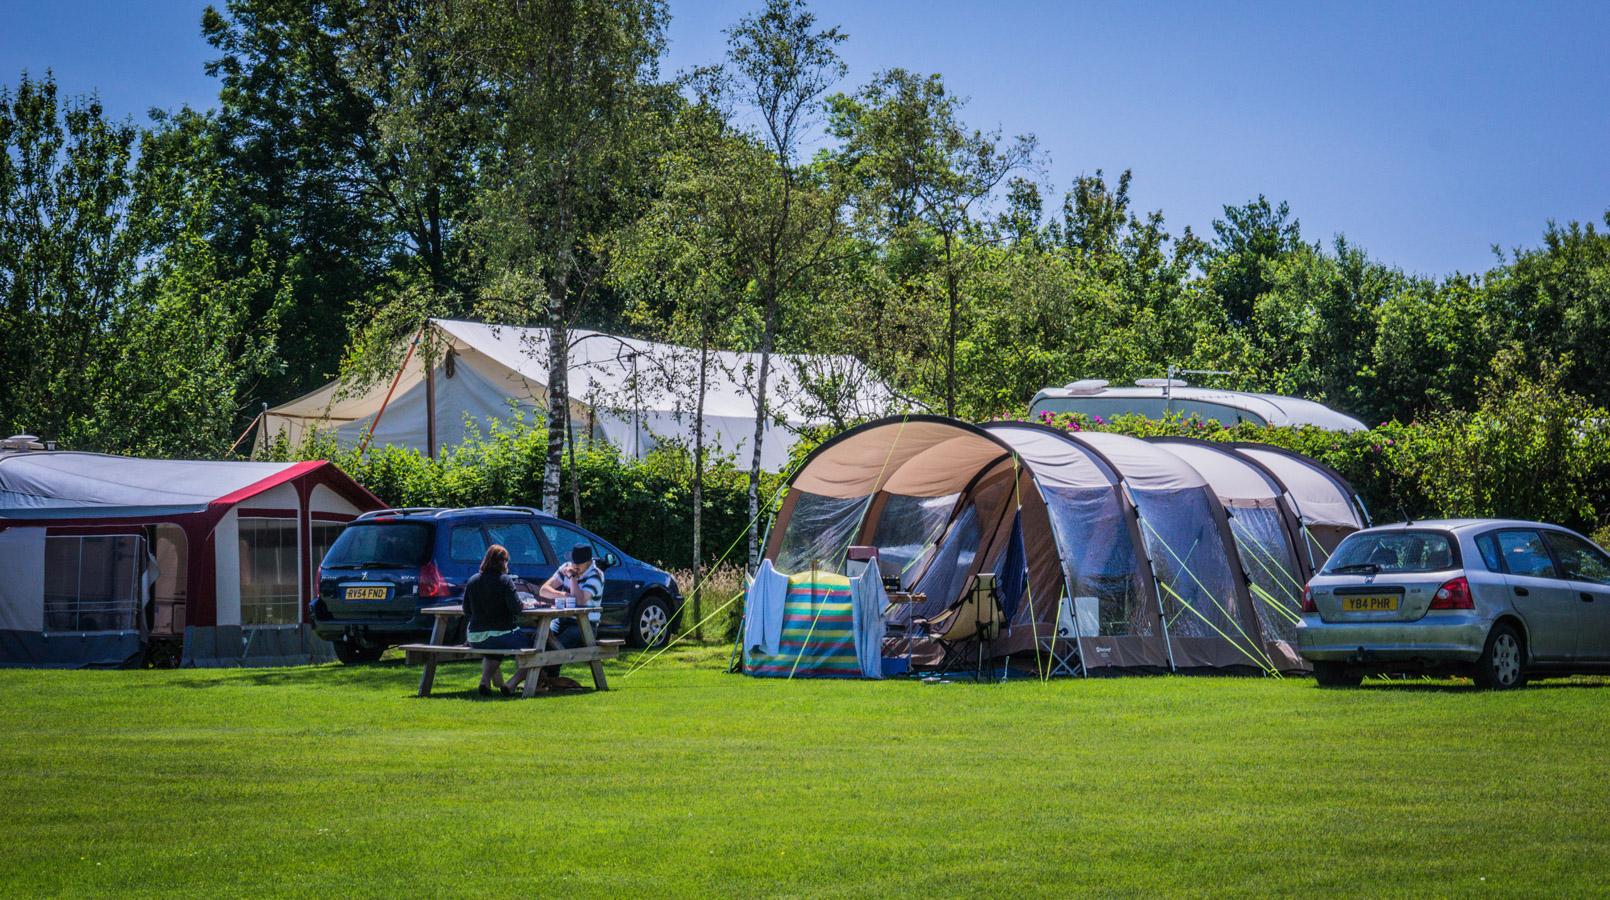 Neil-Bigwood-Monkton-Wyld-Camping-06